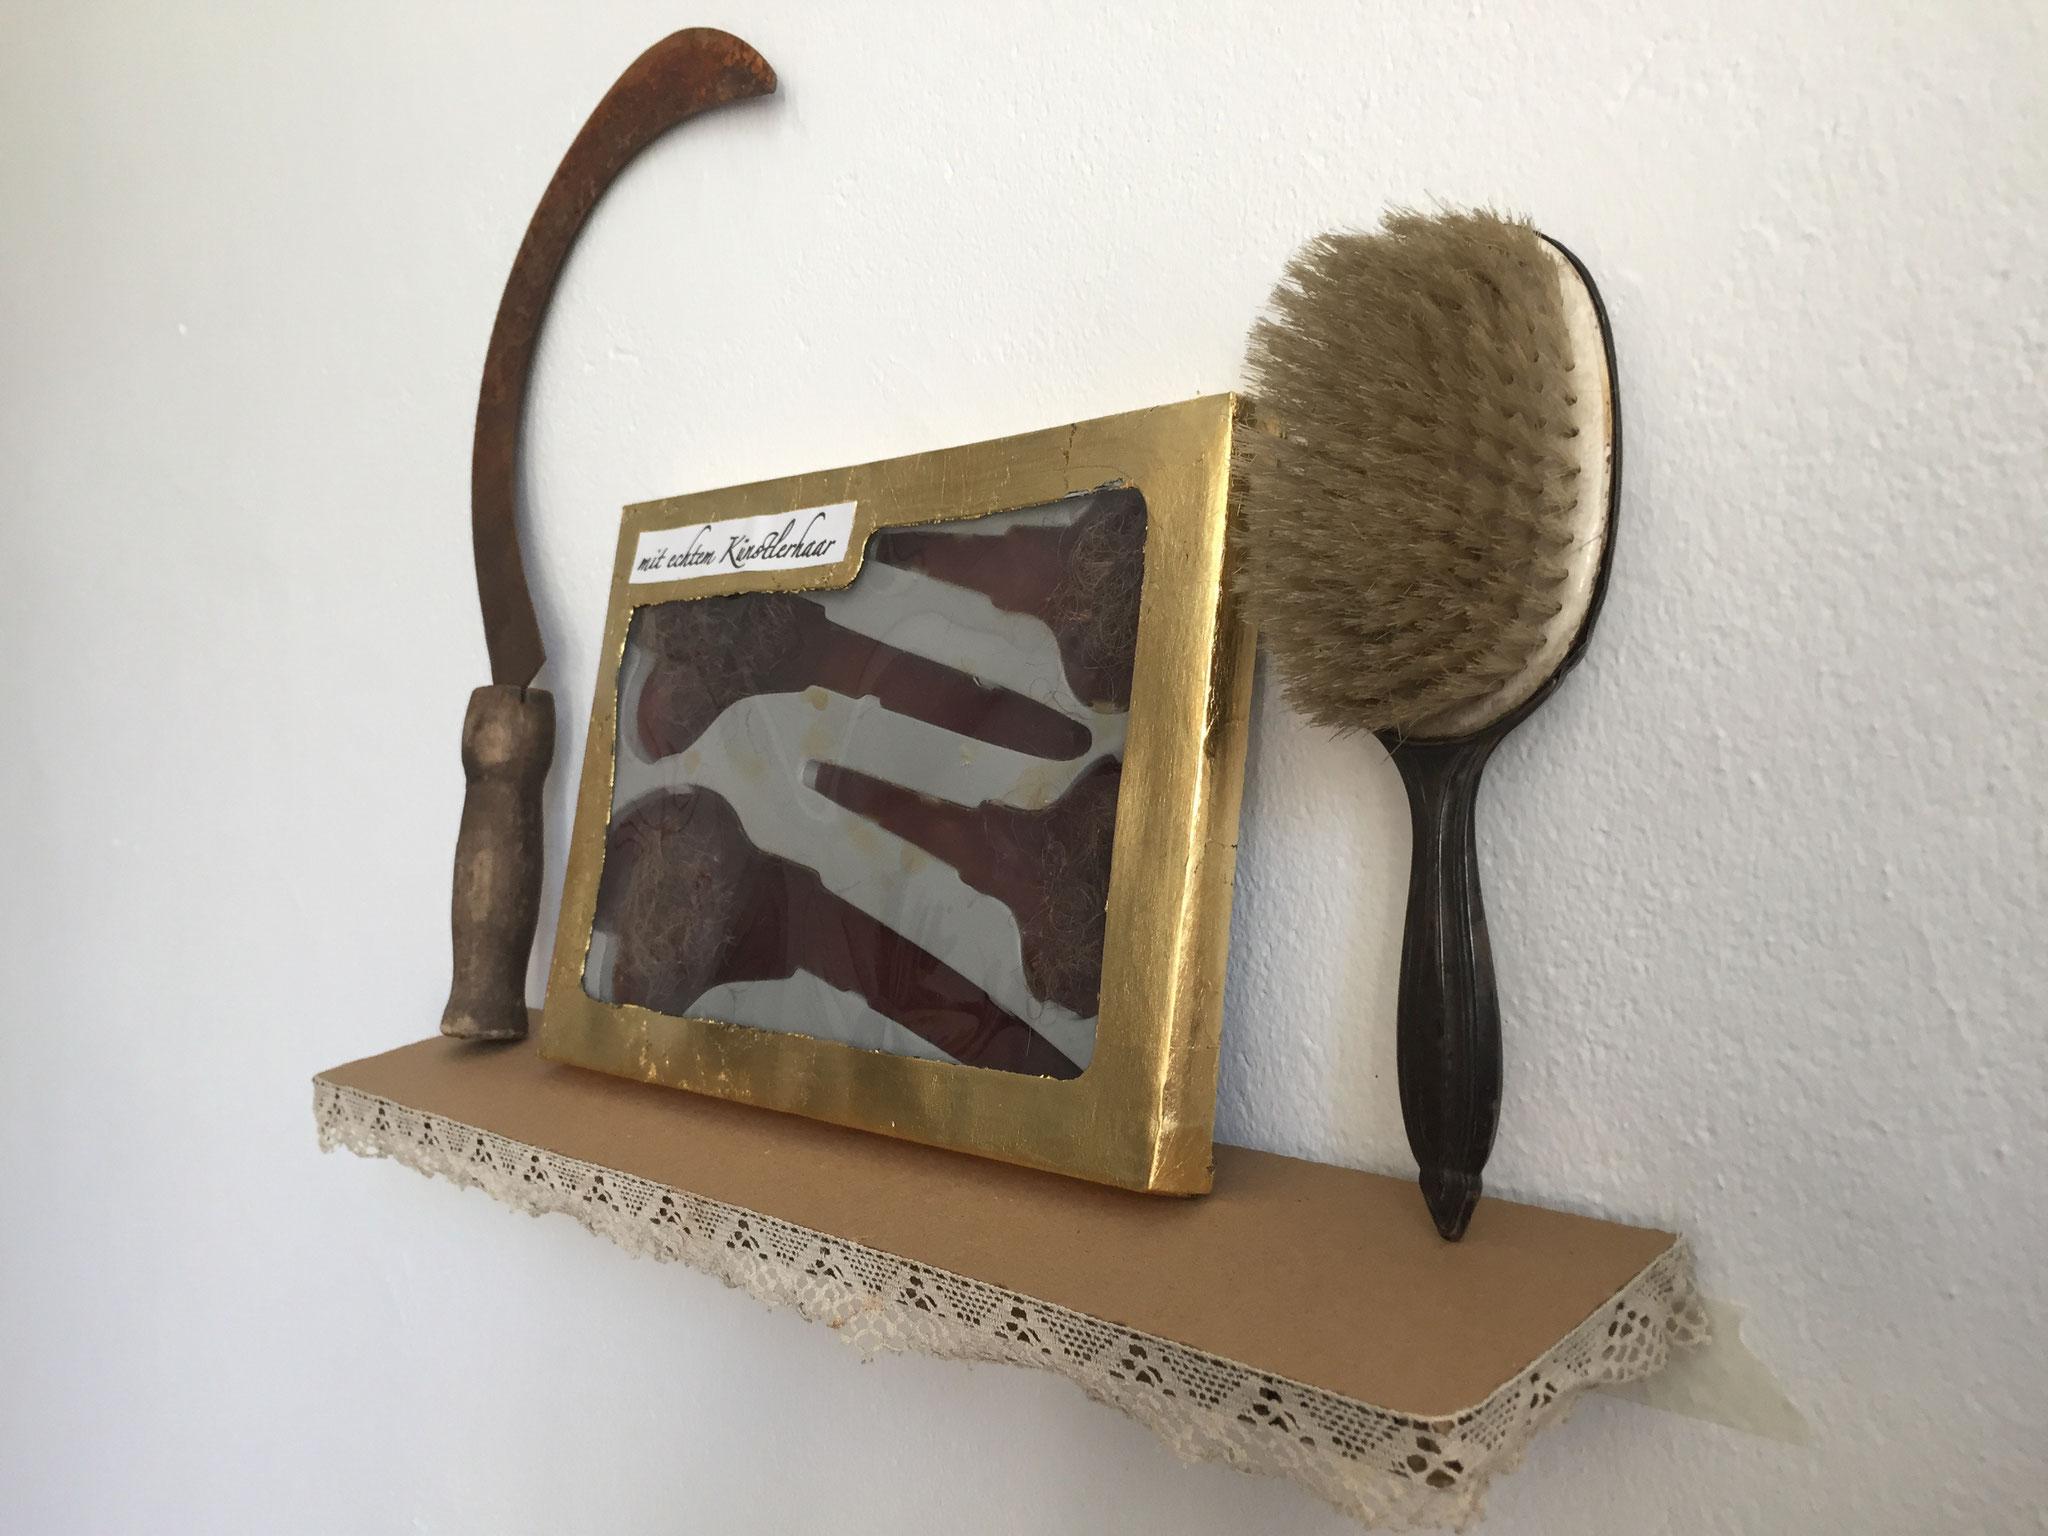 Nur für erfahrene Sammler / Only for experienced collectors / Seulement pour collectionneur averti